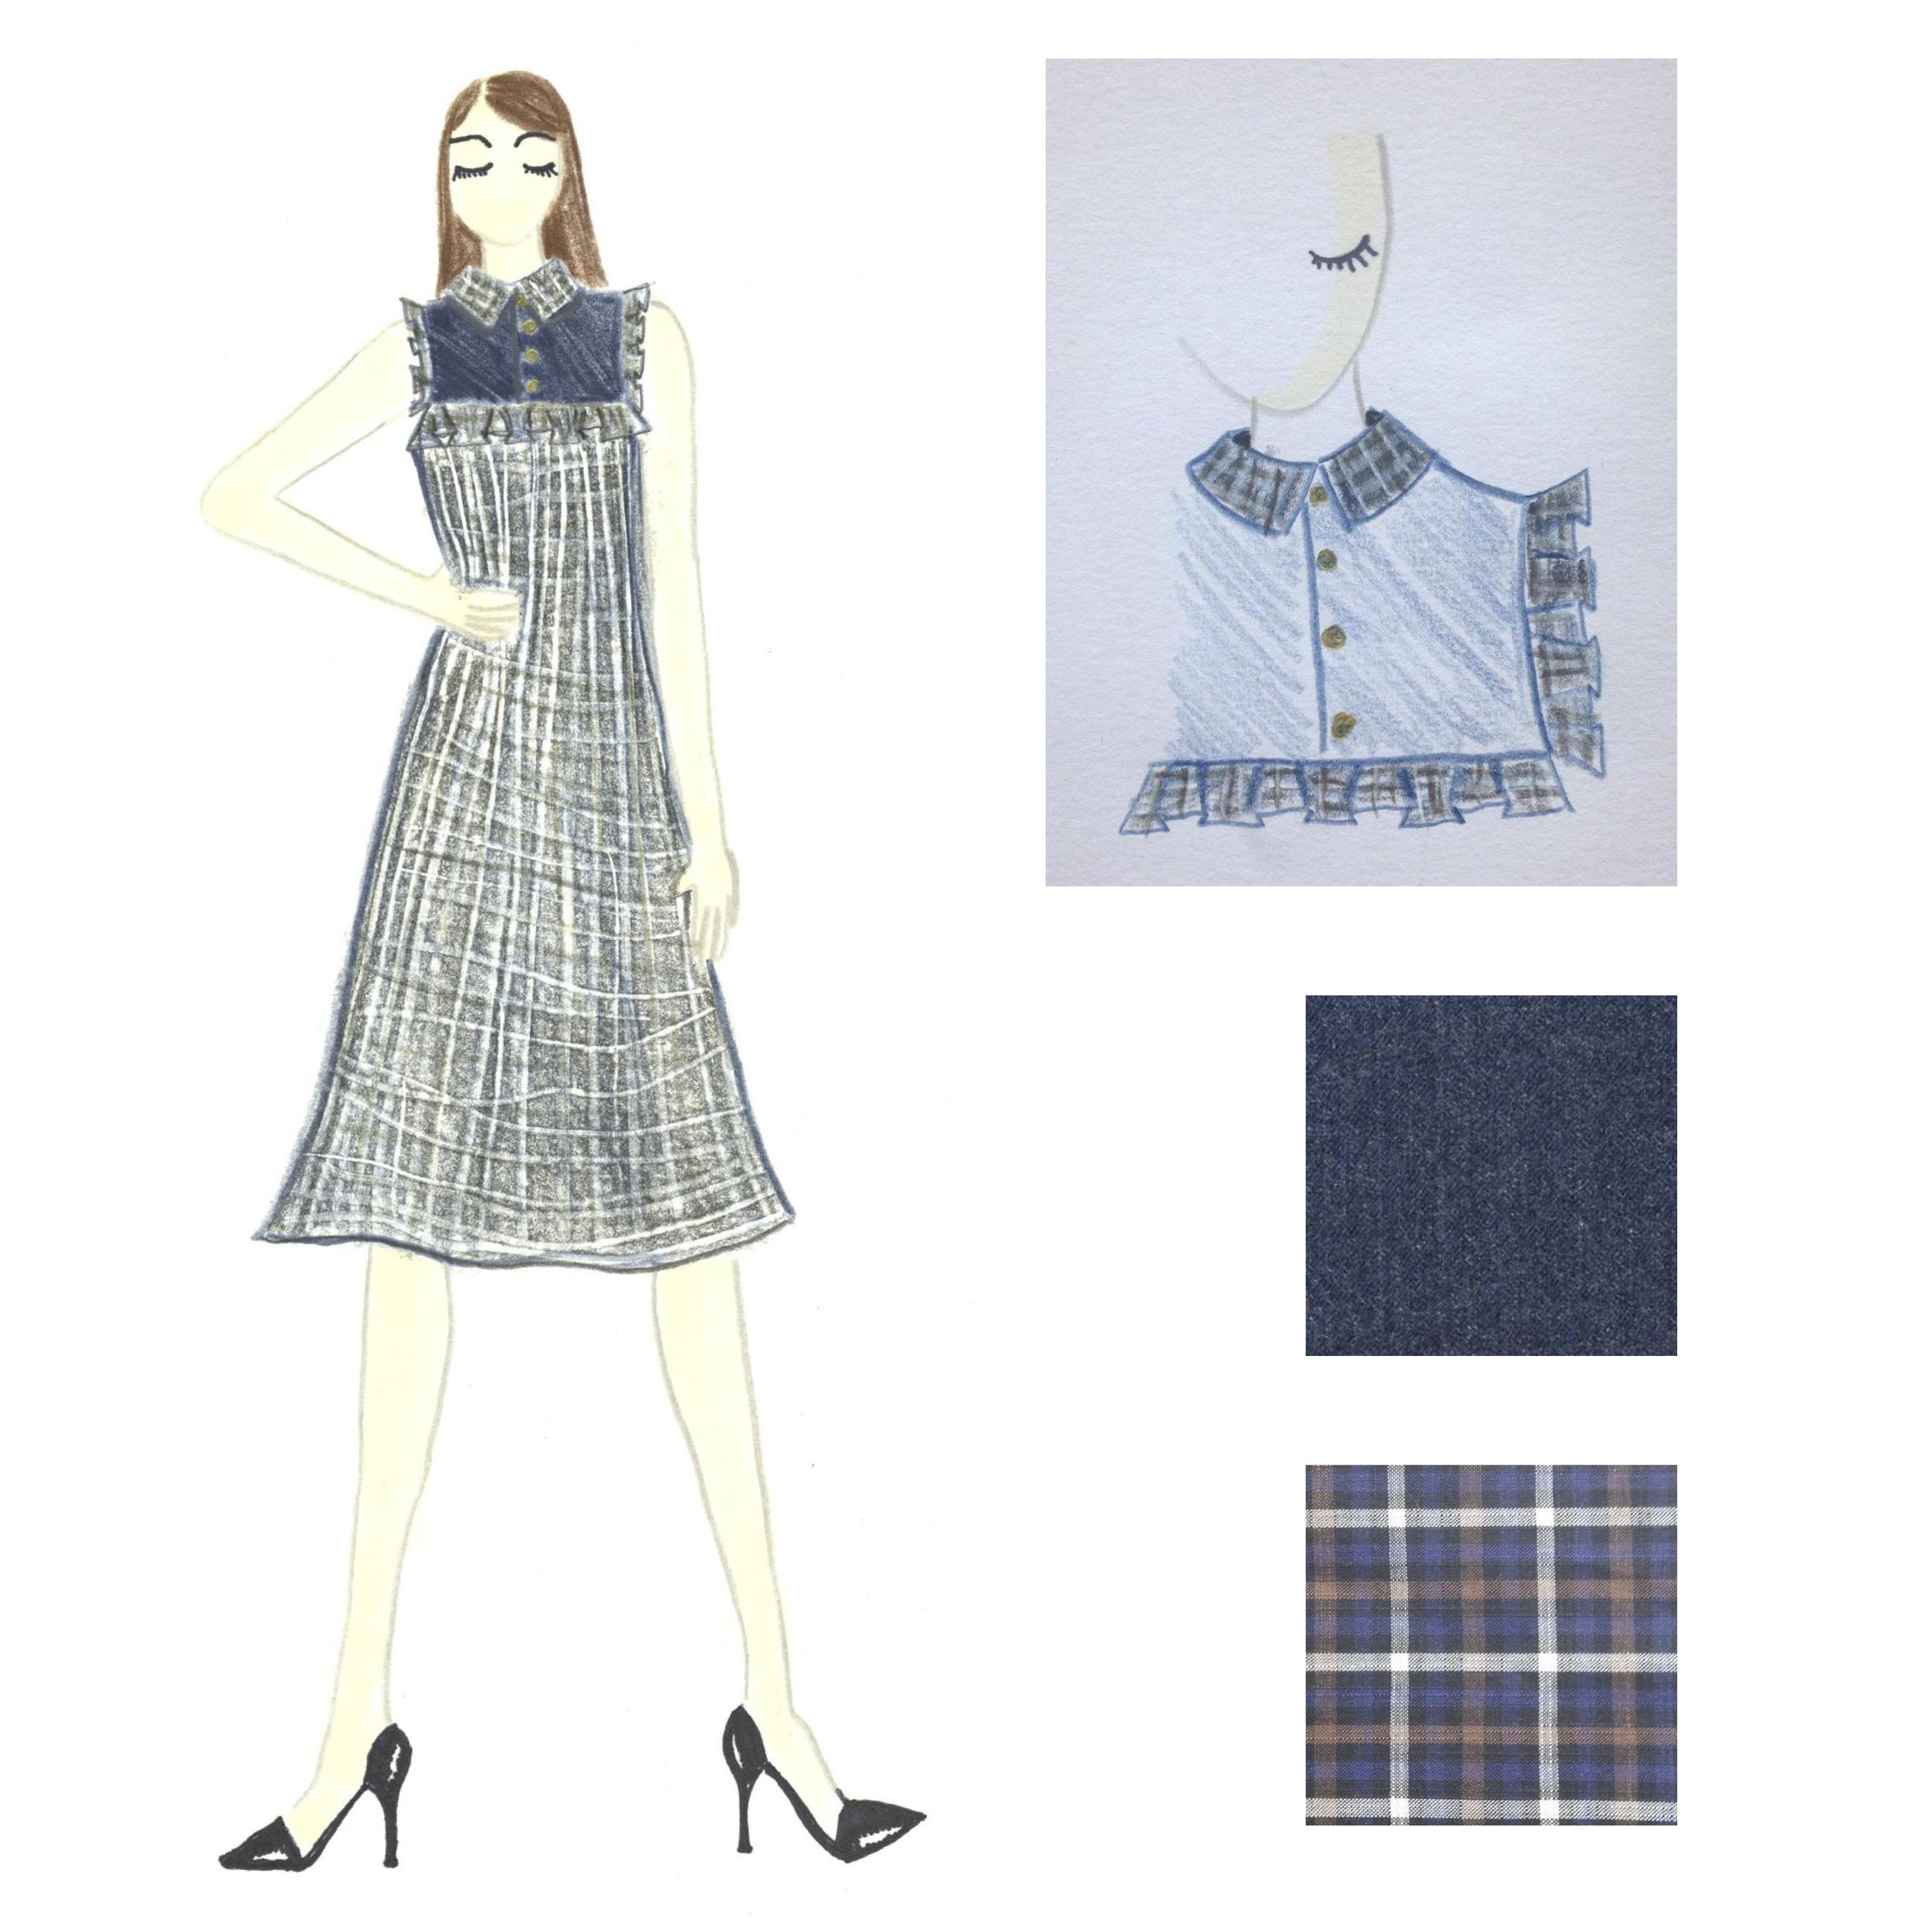 Kvietok_Fashion Illustration Collection (3)